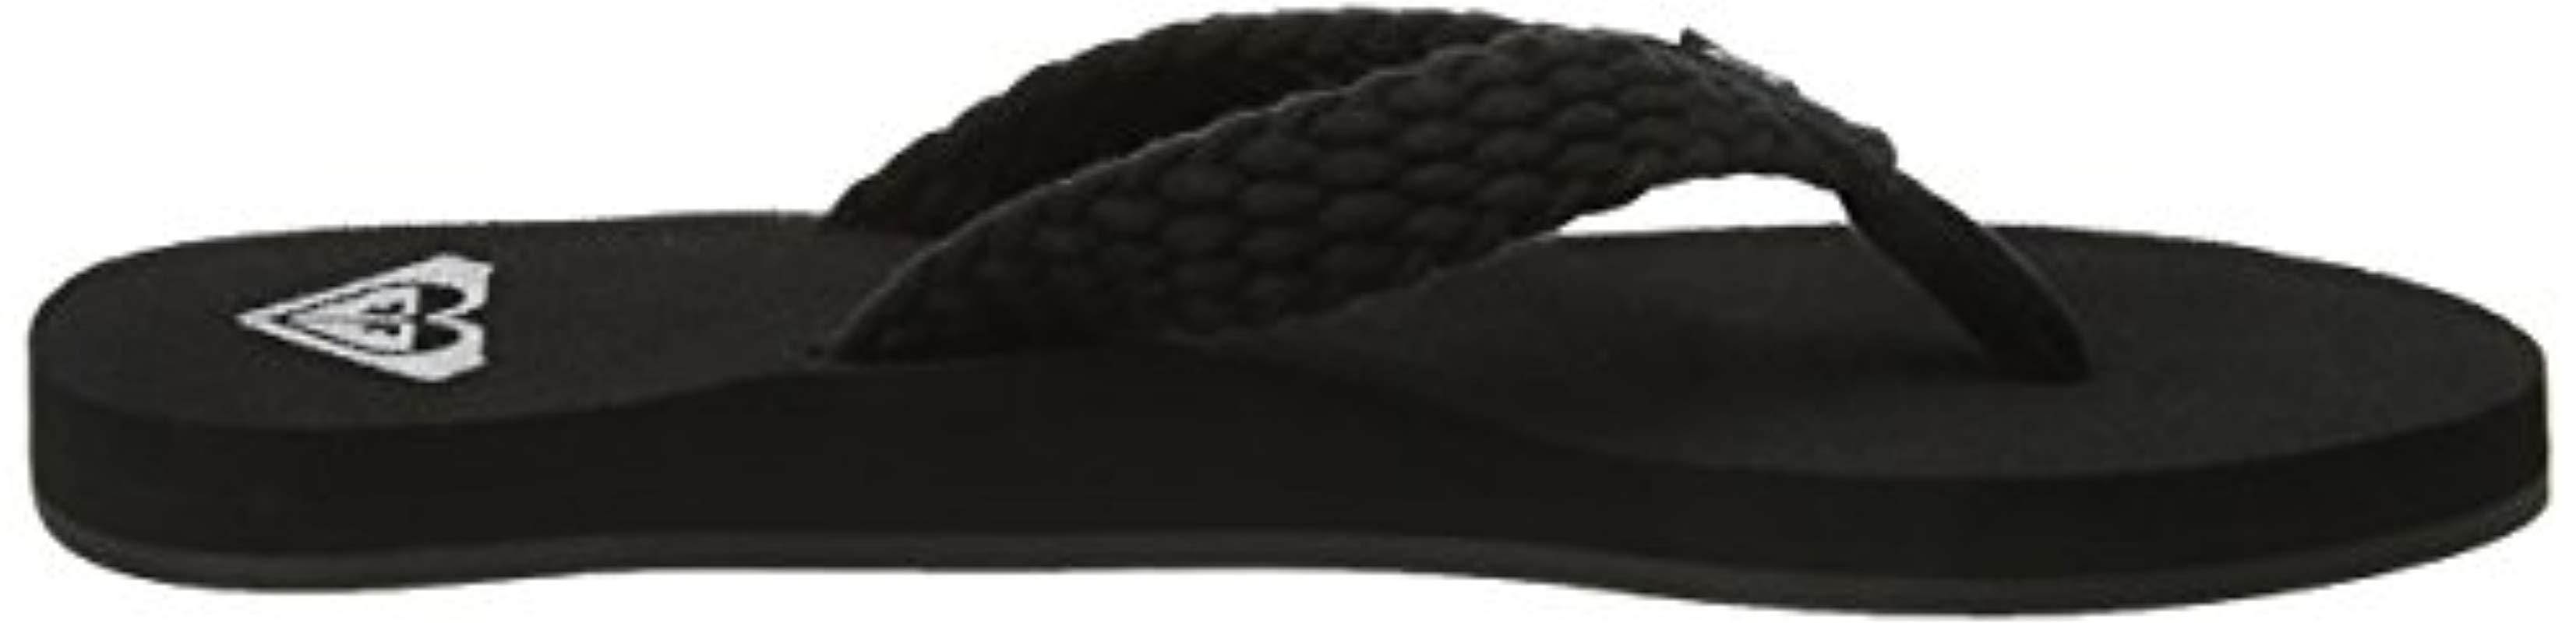 Chaussures de Plage /& Piscine Femme Roxy Porto II